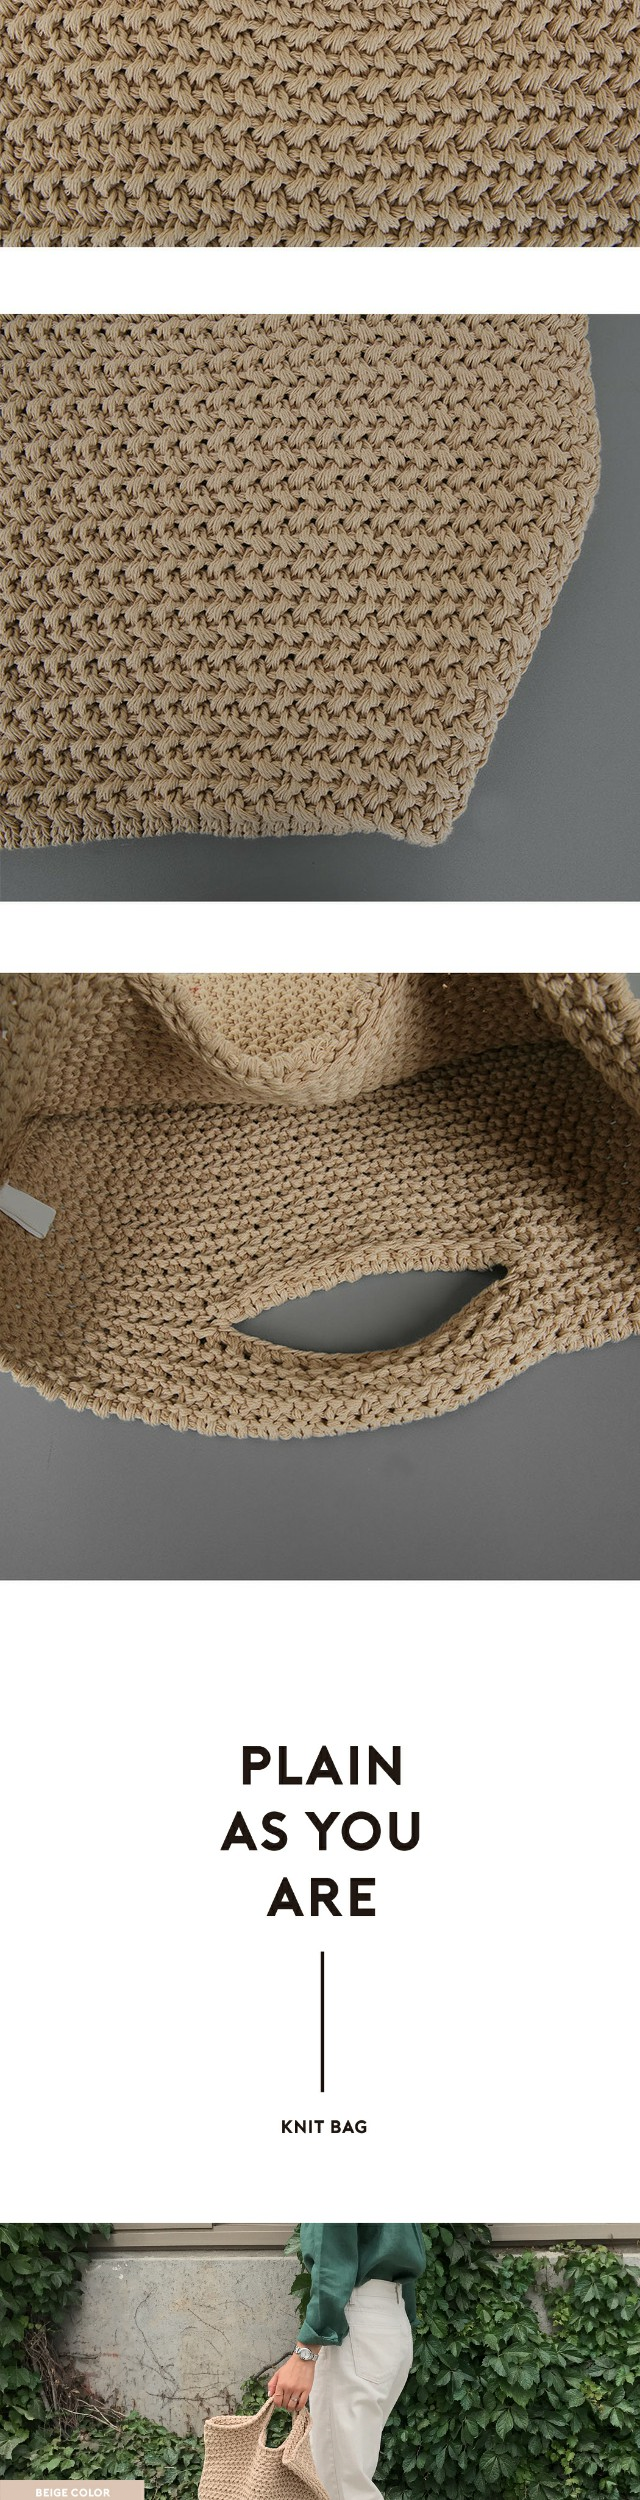 Crunch knit (bag)